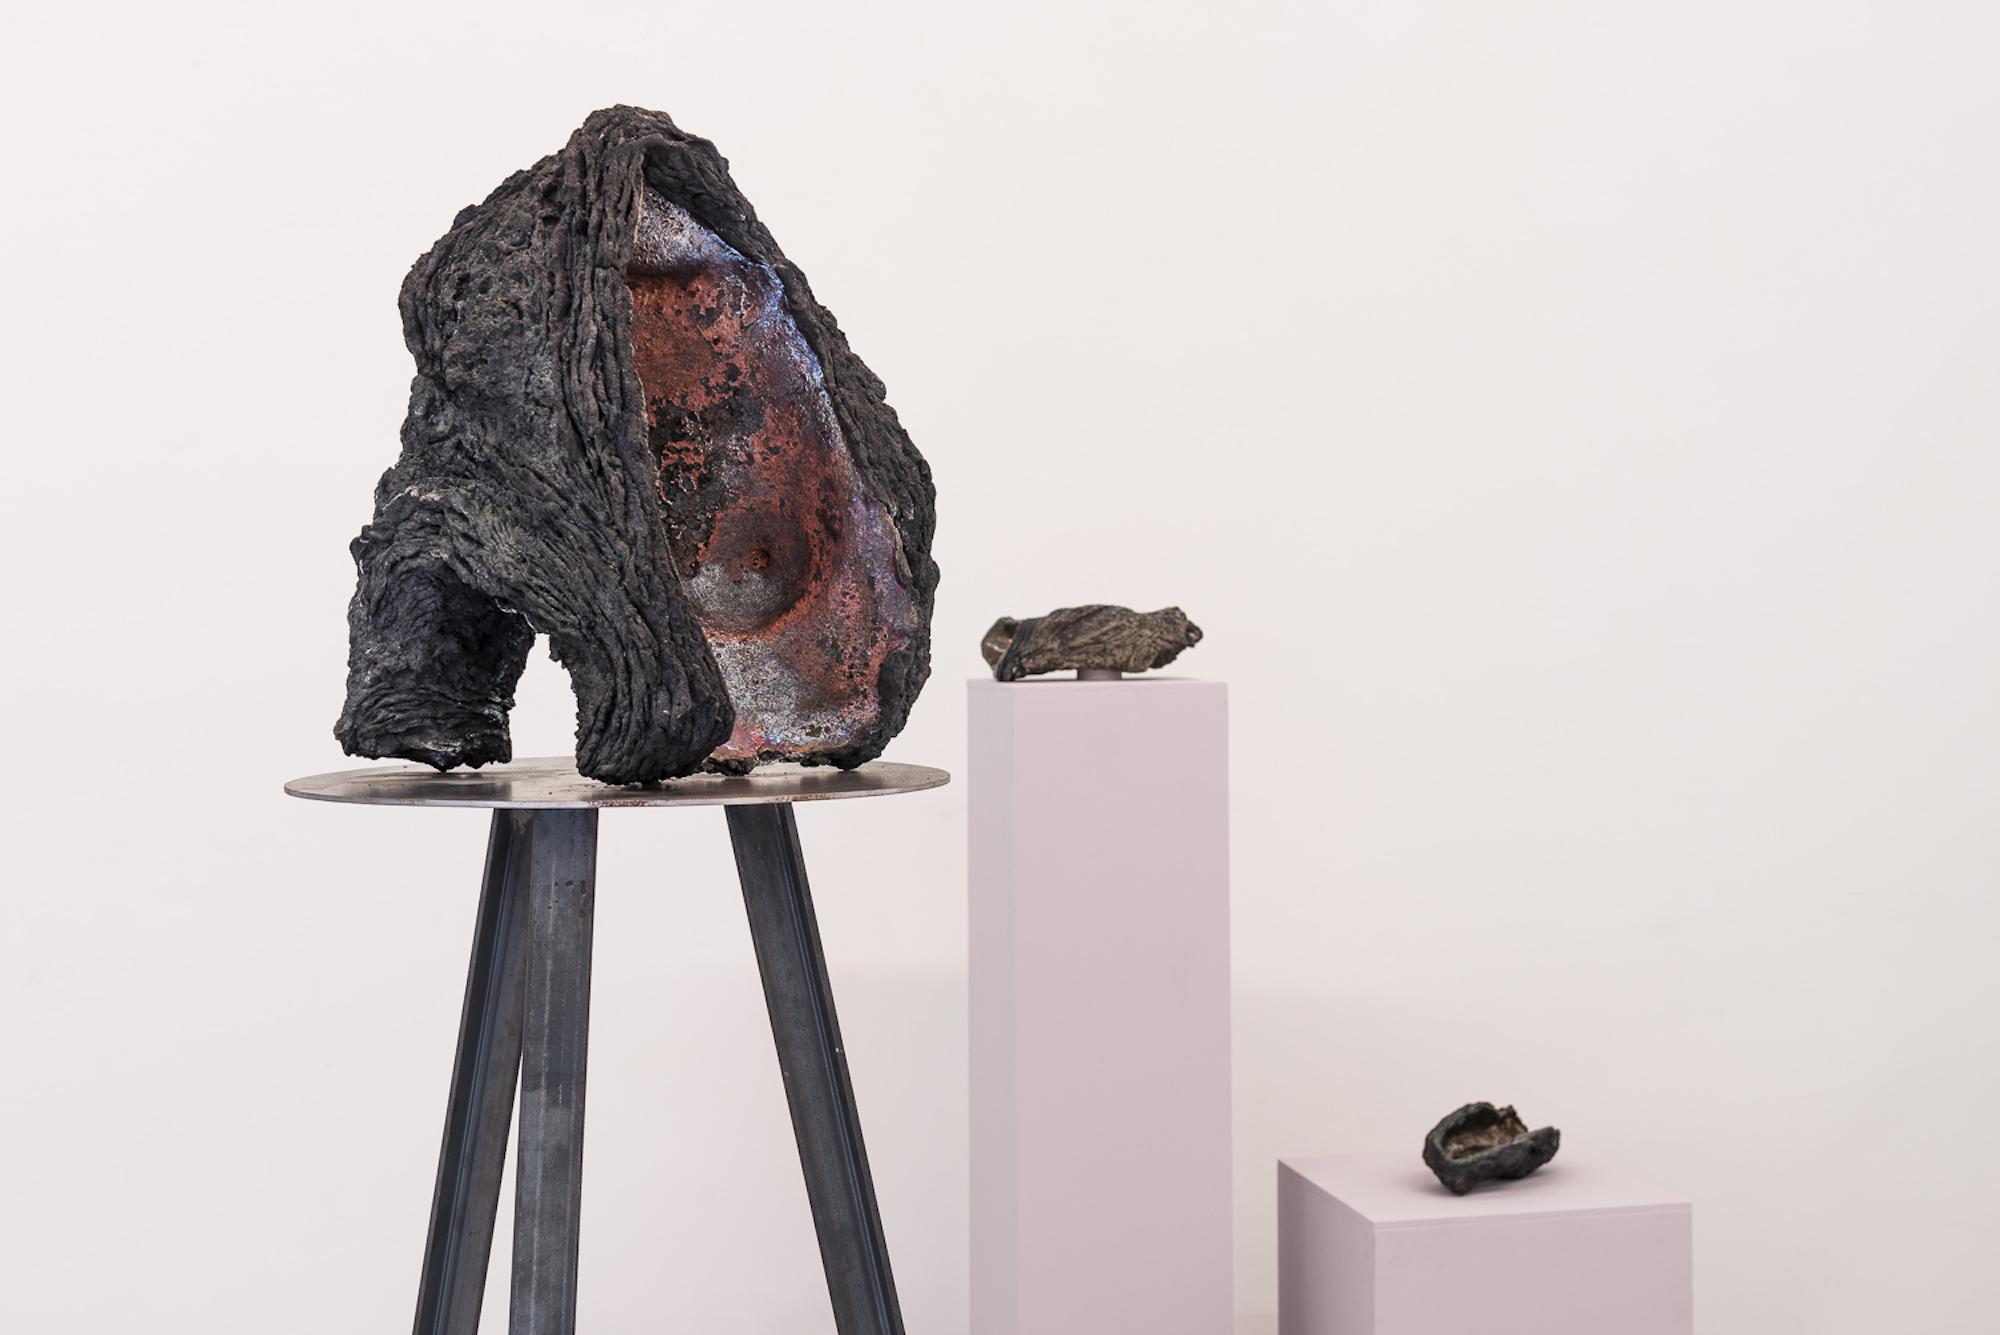 Cleo Fariselli, Dy Yiayi, Exhibition detail. Operativa, Rome. Photo Sebastiano Luciano. 6